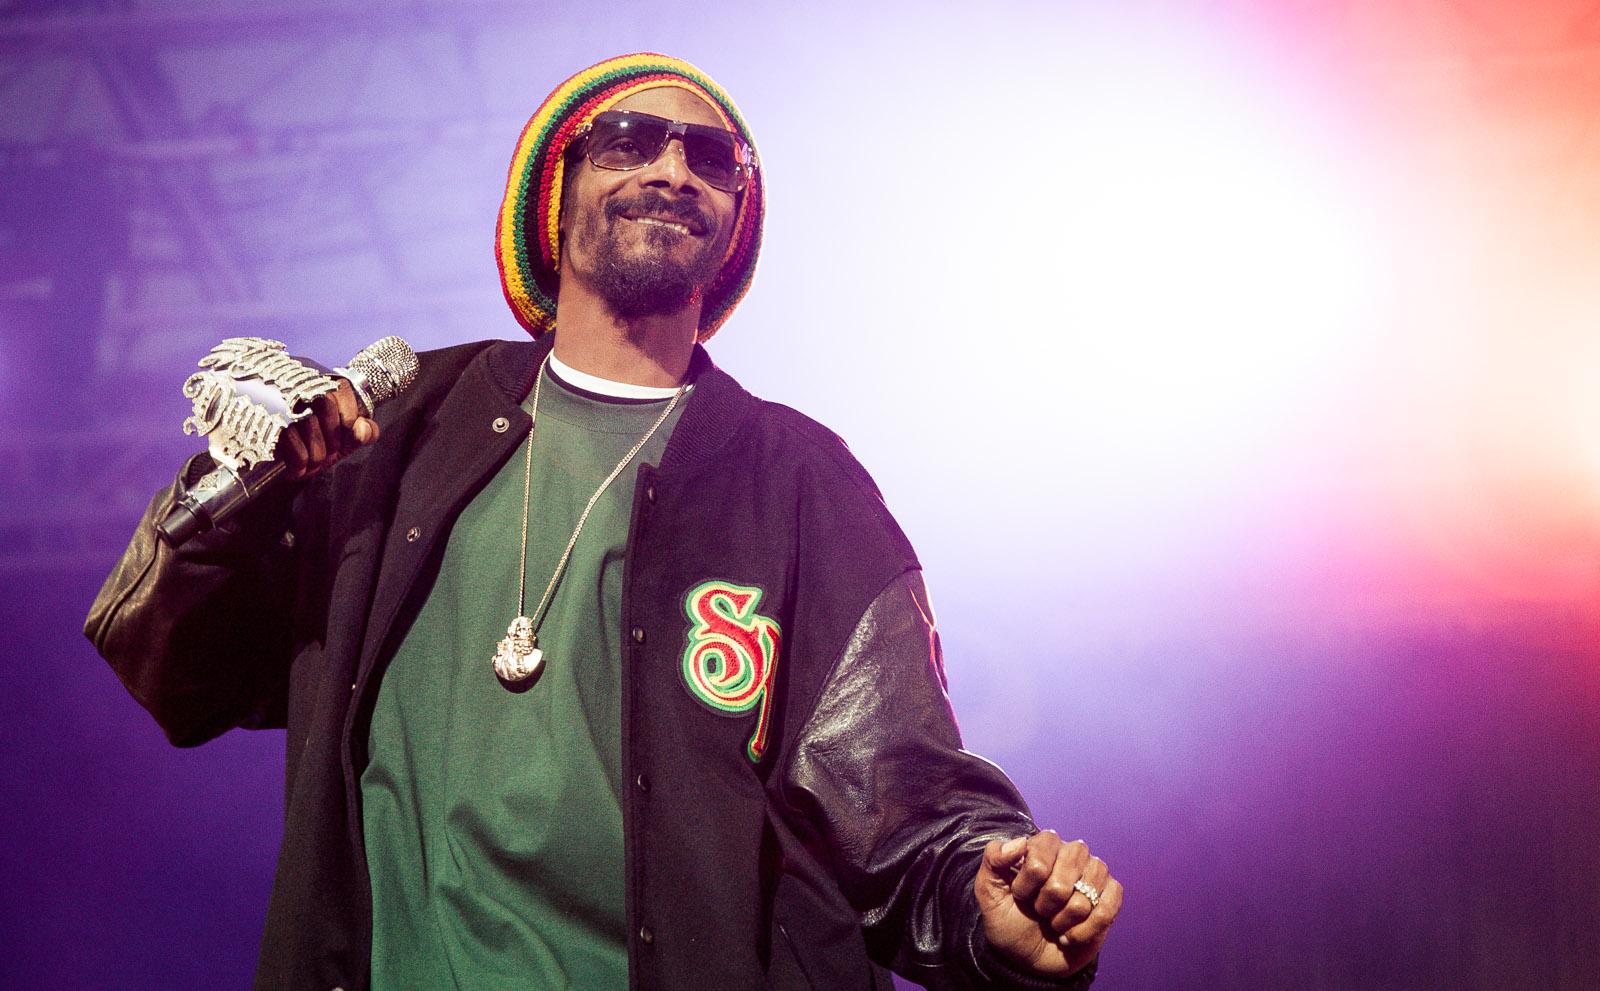 Snoop Dogg - Fotocredits: Jorund Foreland Pedersen (Wikimedia Commons)